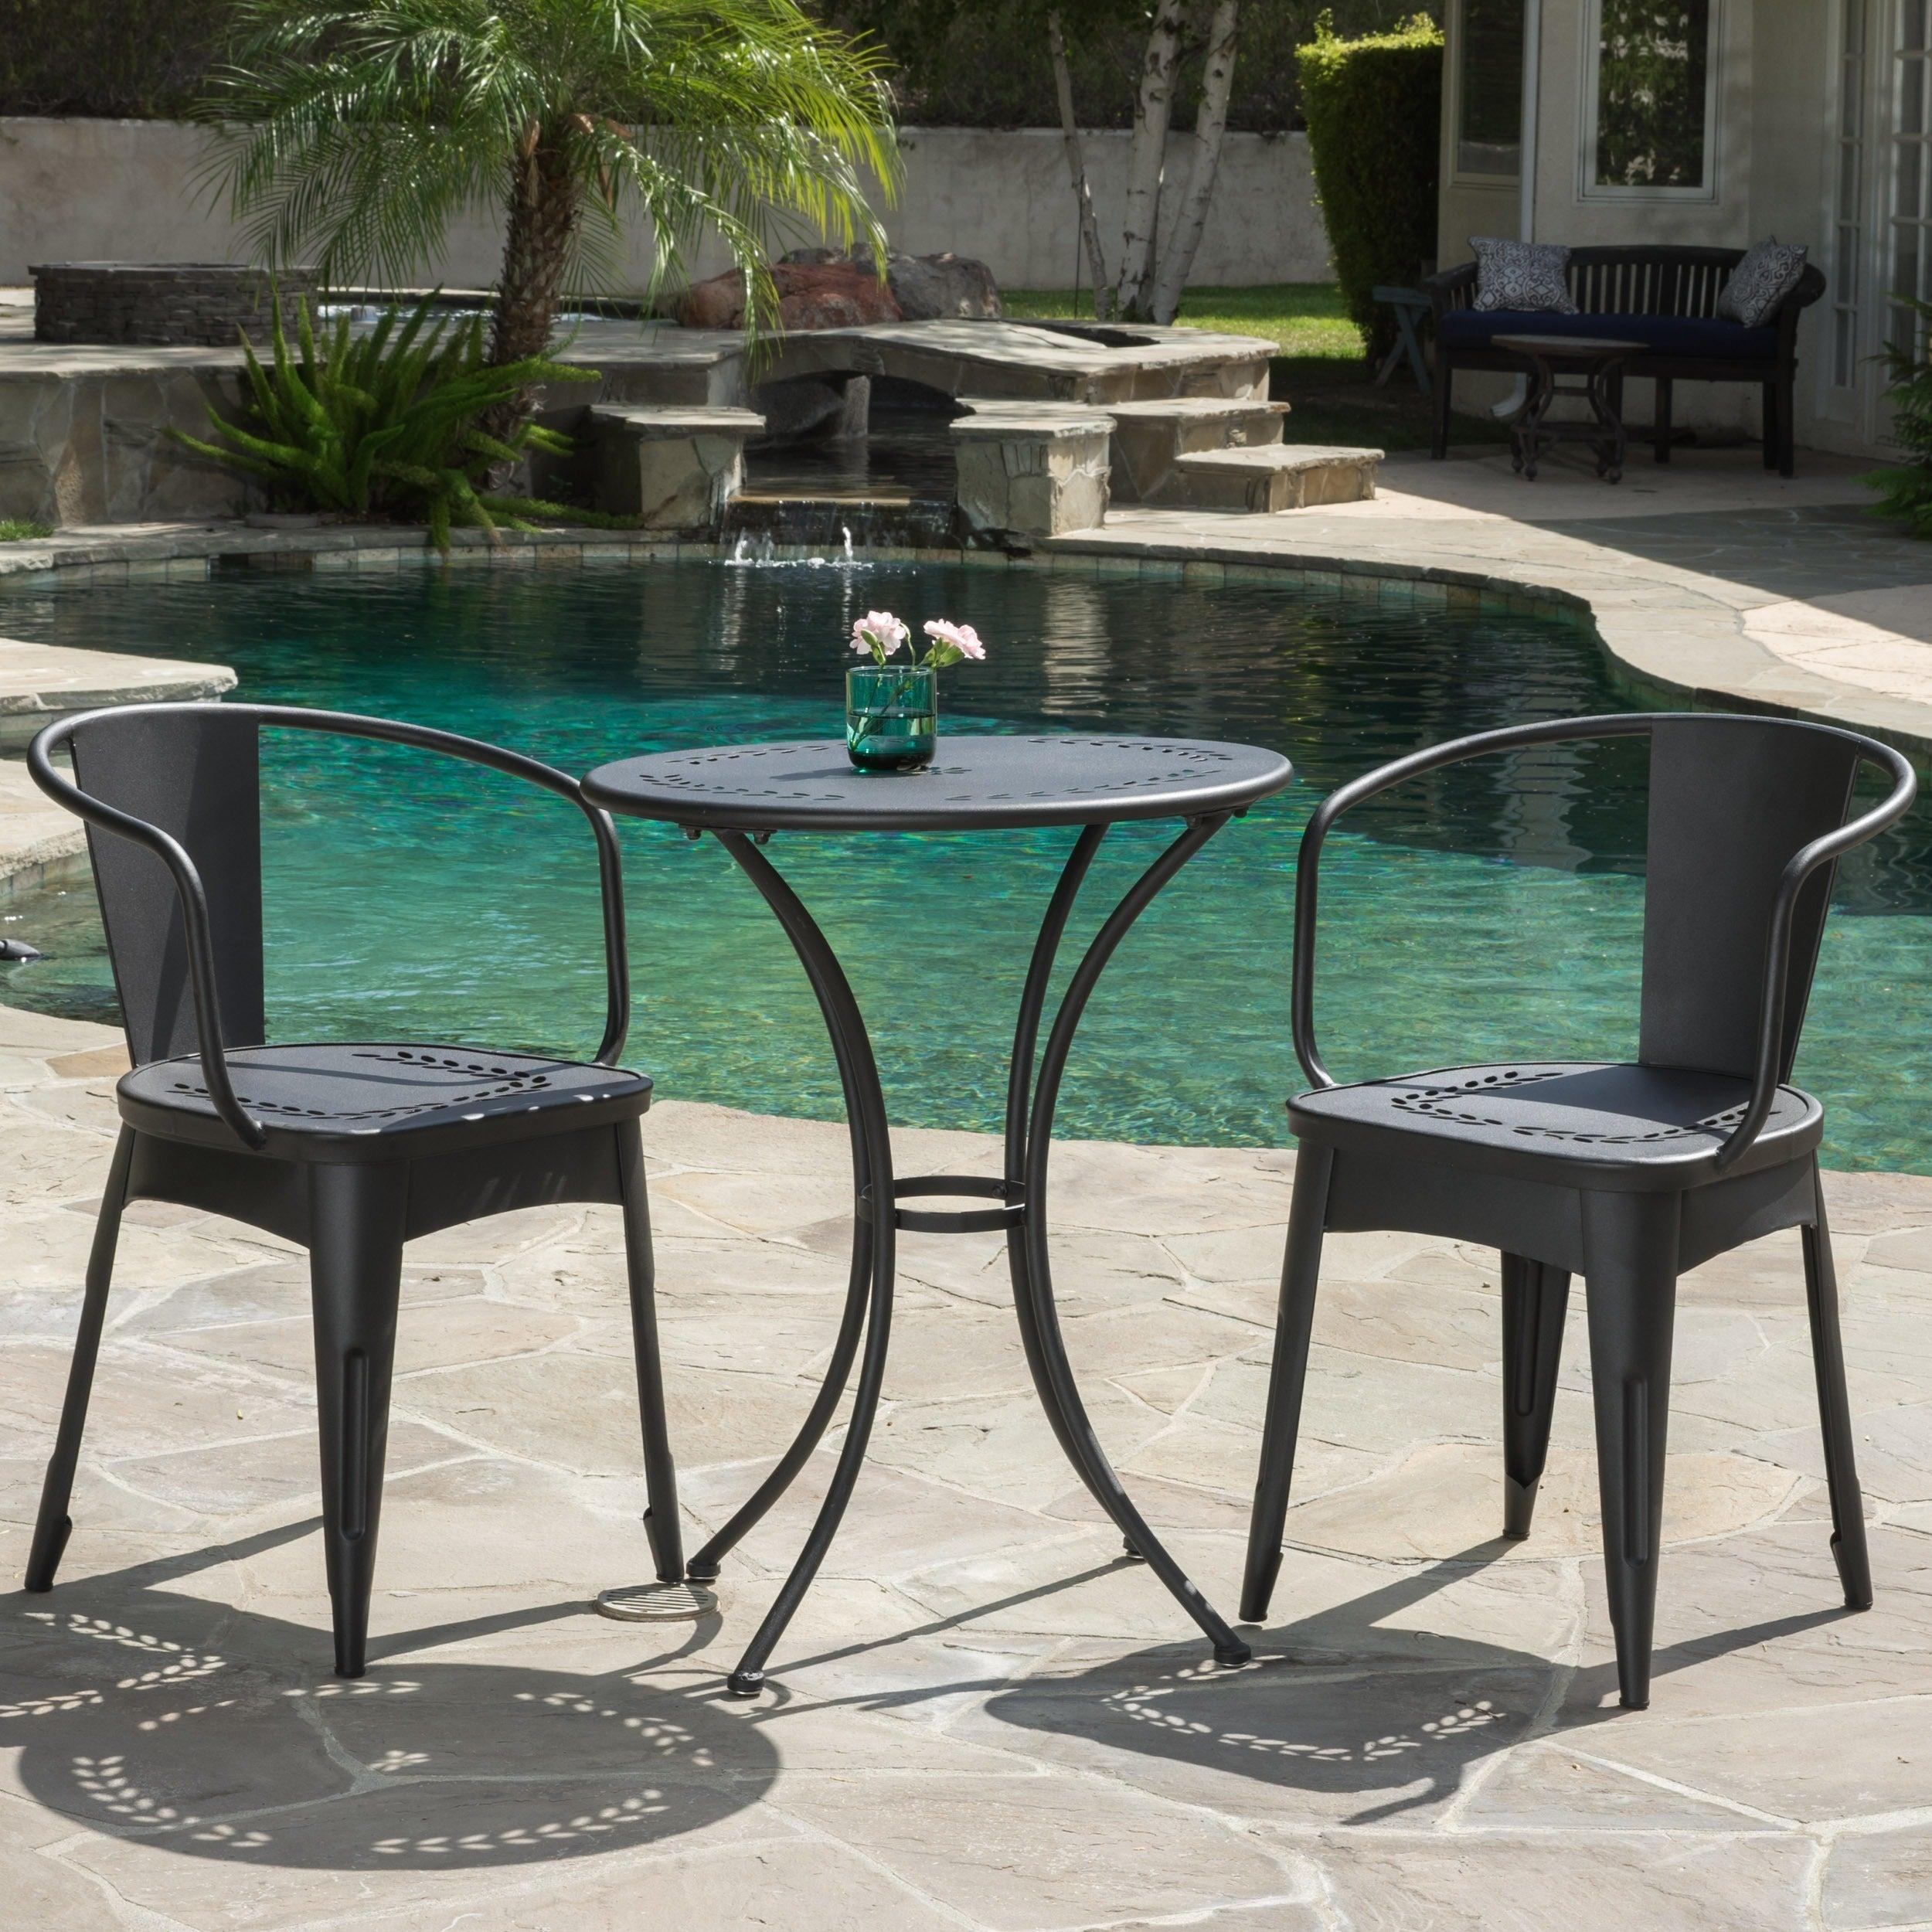 Bistro Set Outdoor Coffee Table Cast Iron Garden Patio